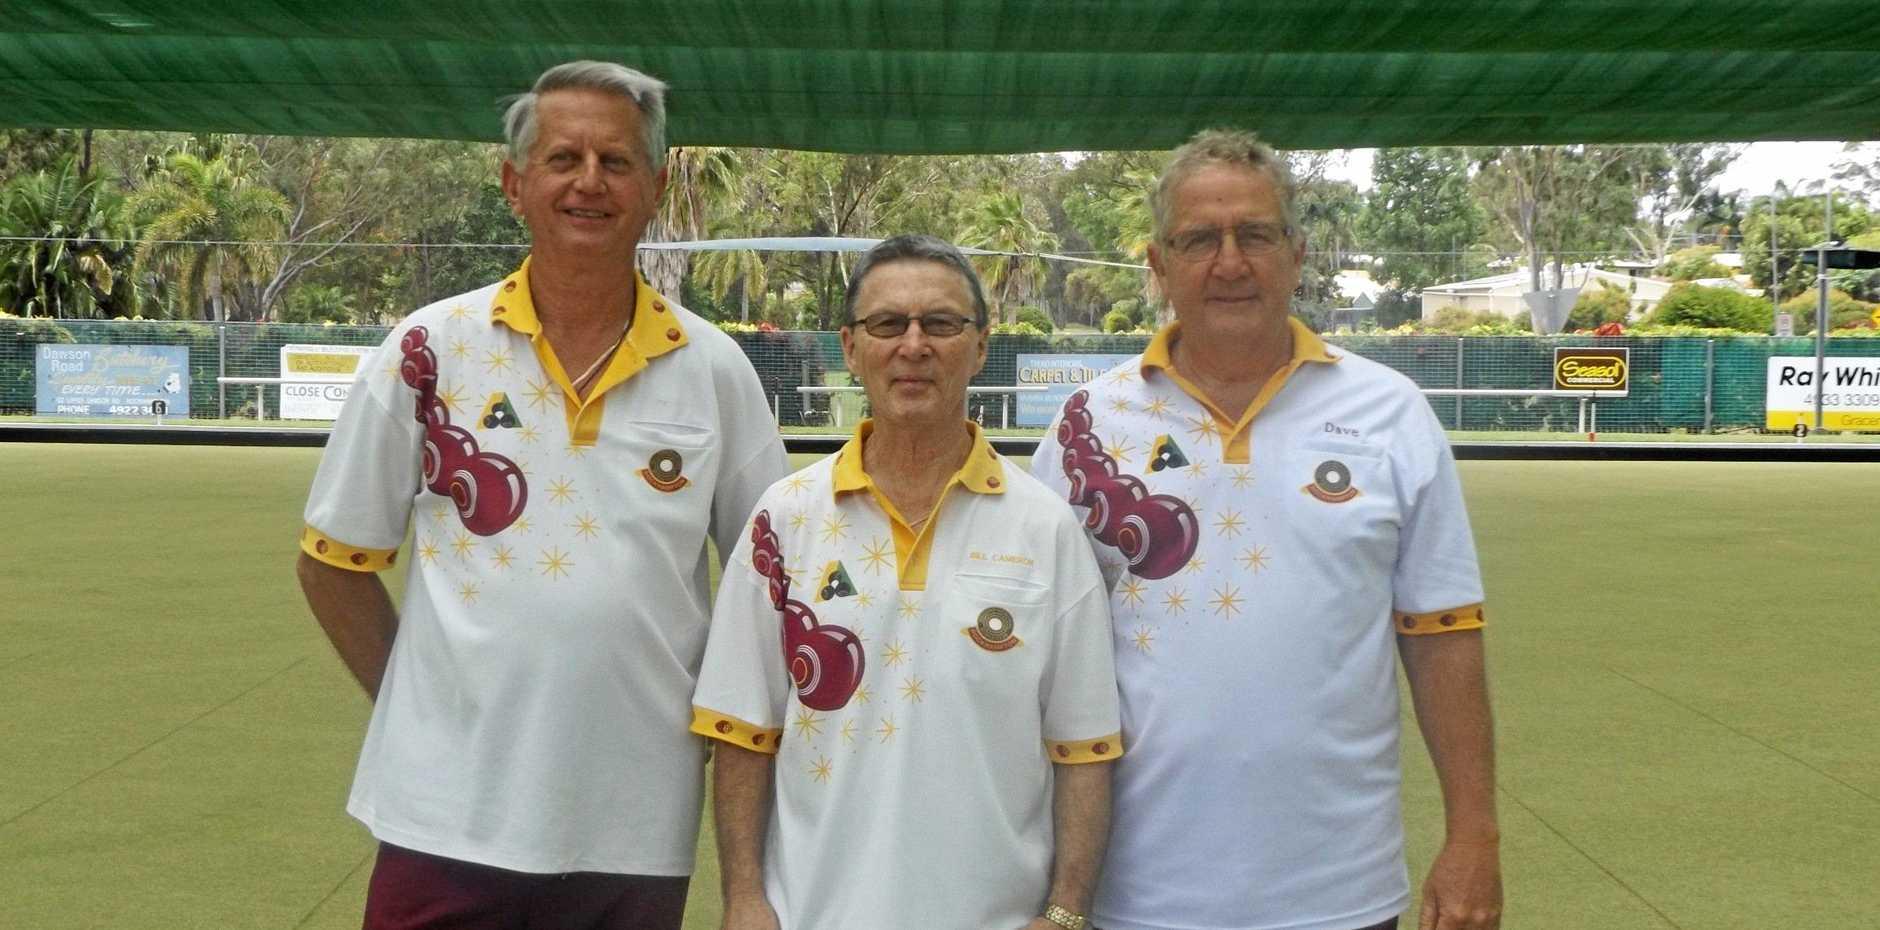 The winning team of John Lenon, Bill Cameron and Dave Millar.